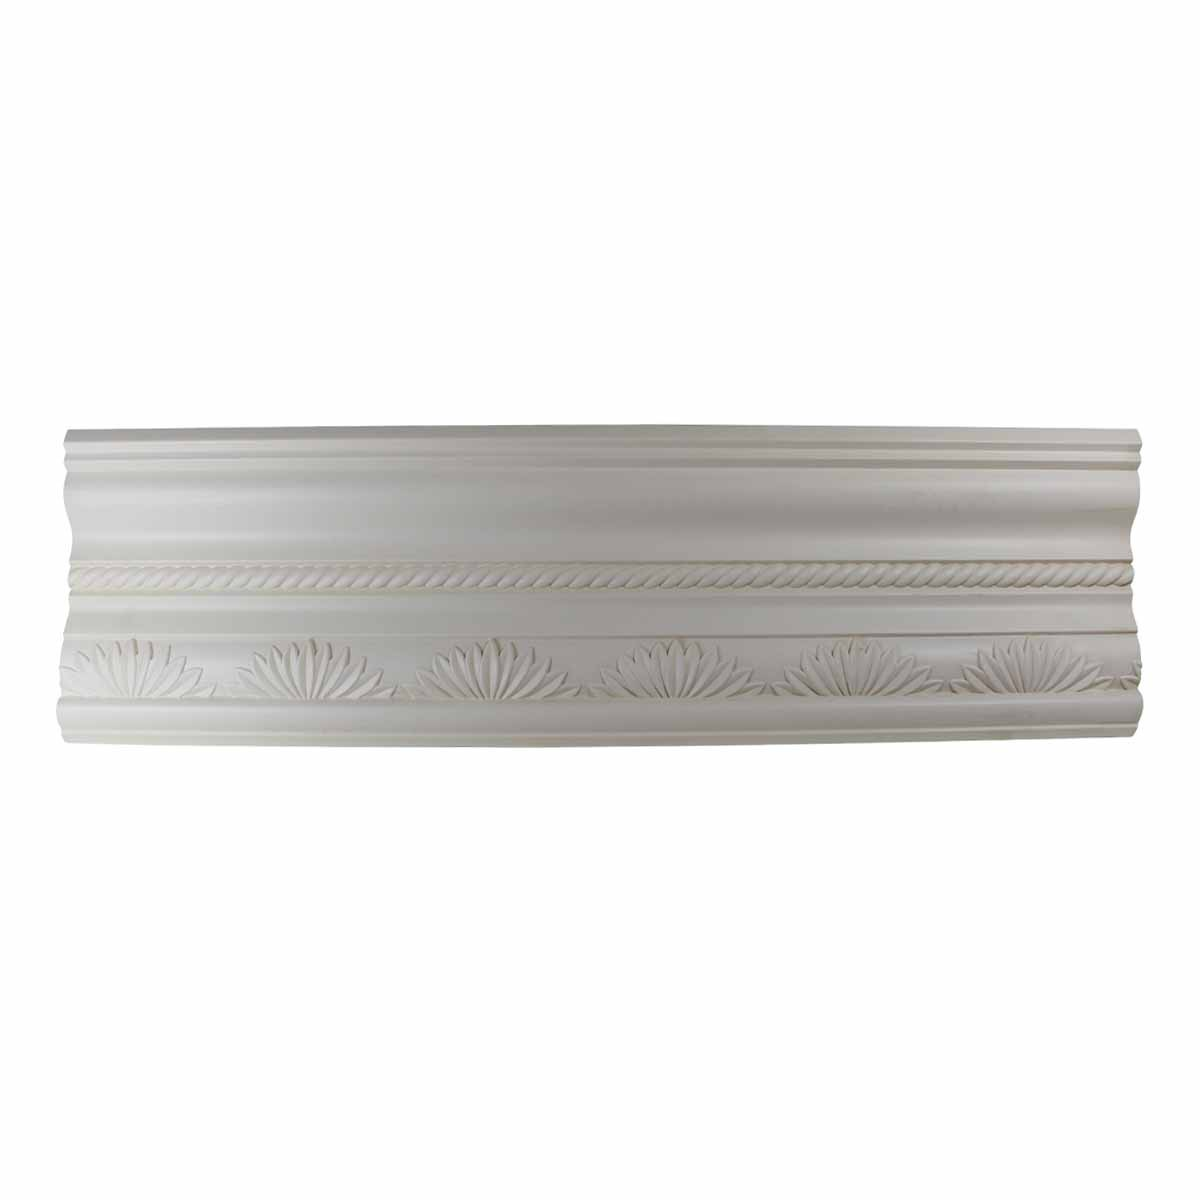 Cornice White Urethane Sample of 10985 23.5 Long Cornice Cornice Moulding Cornice Molding